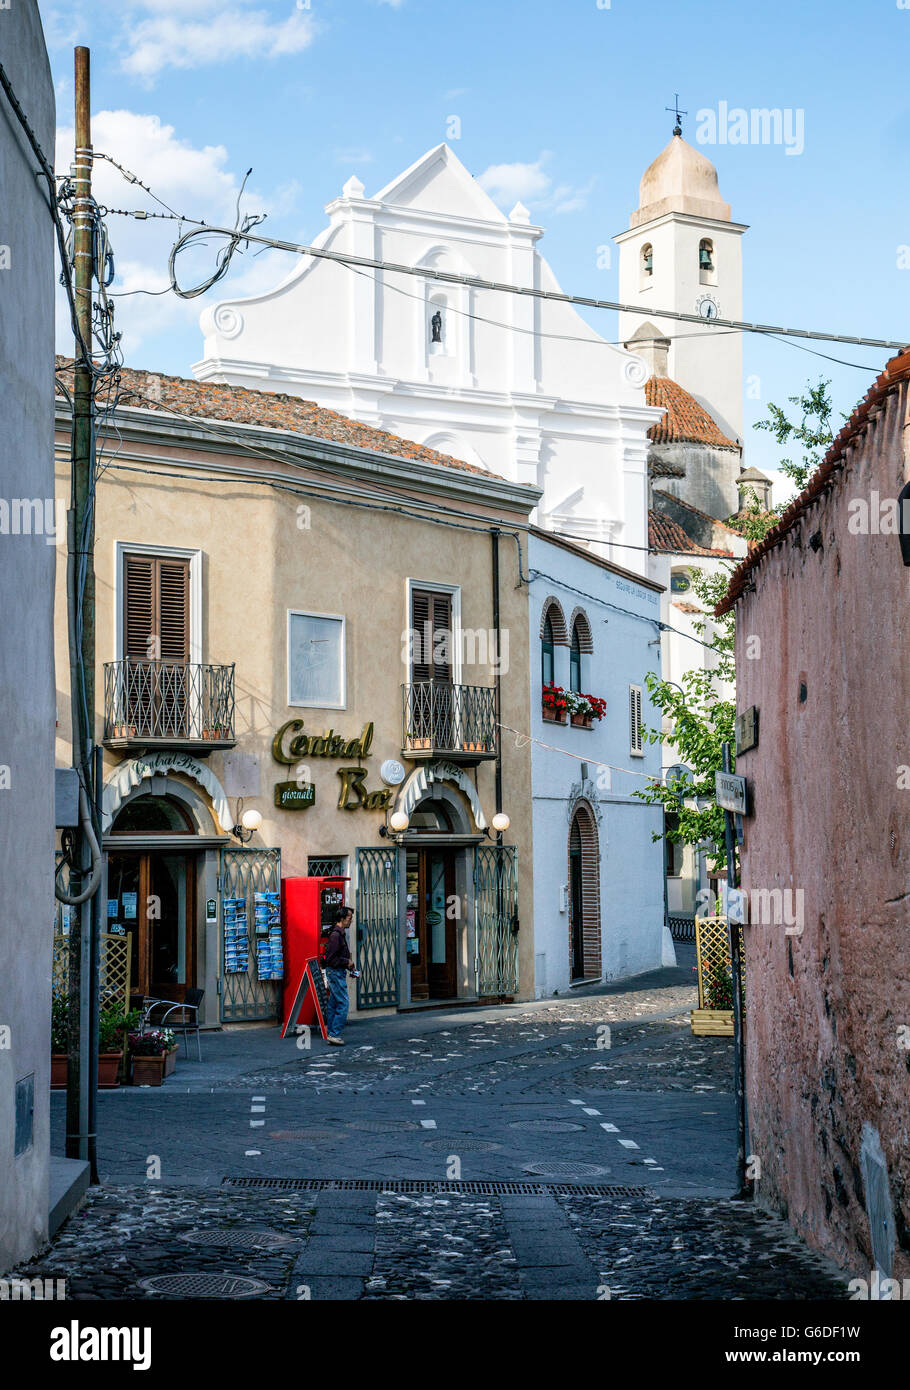 Cobbled Streets  Orosei Sardinia Italy - Stock Image